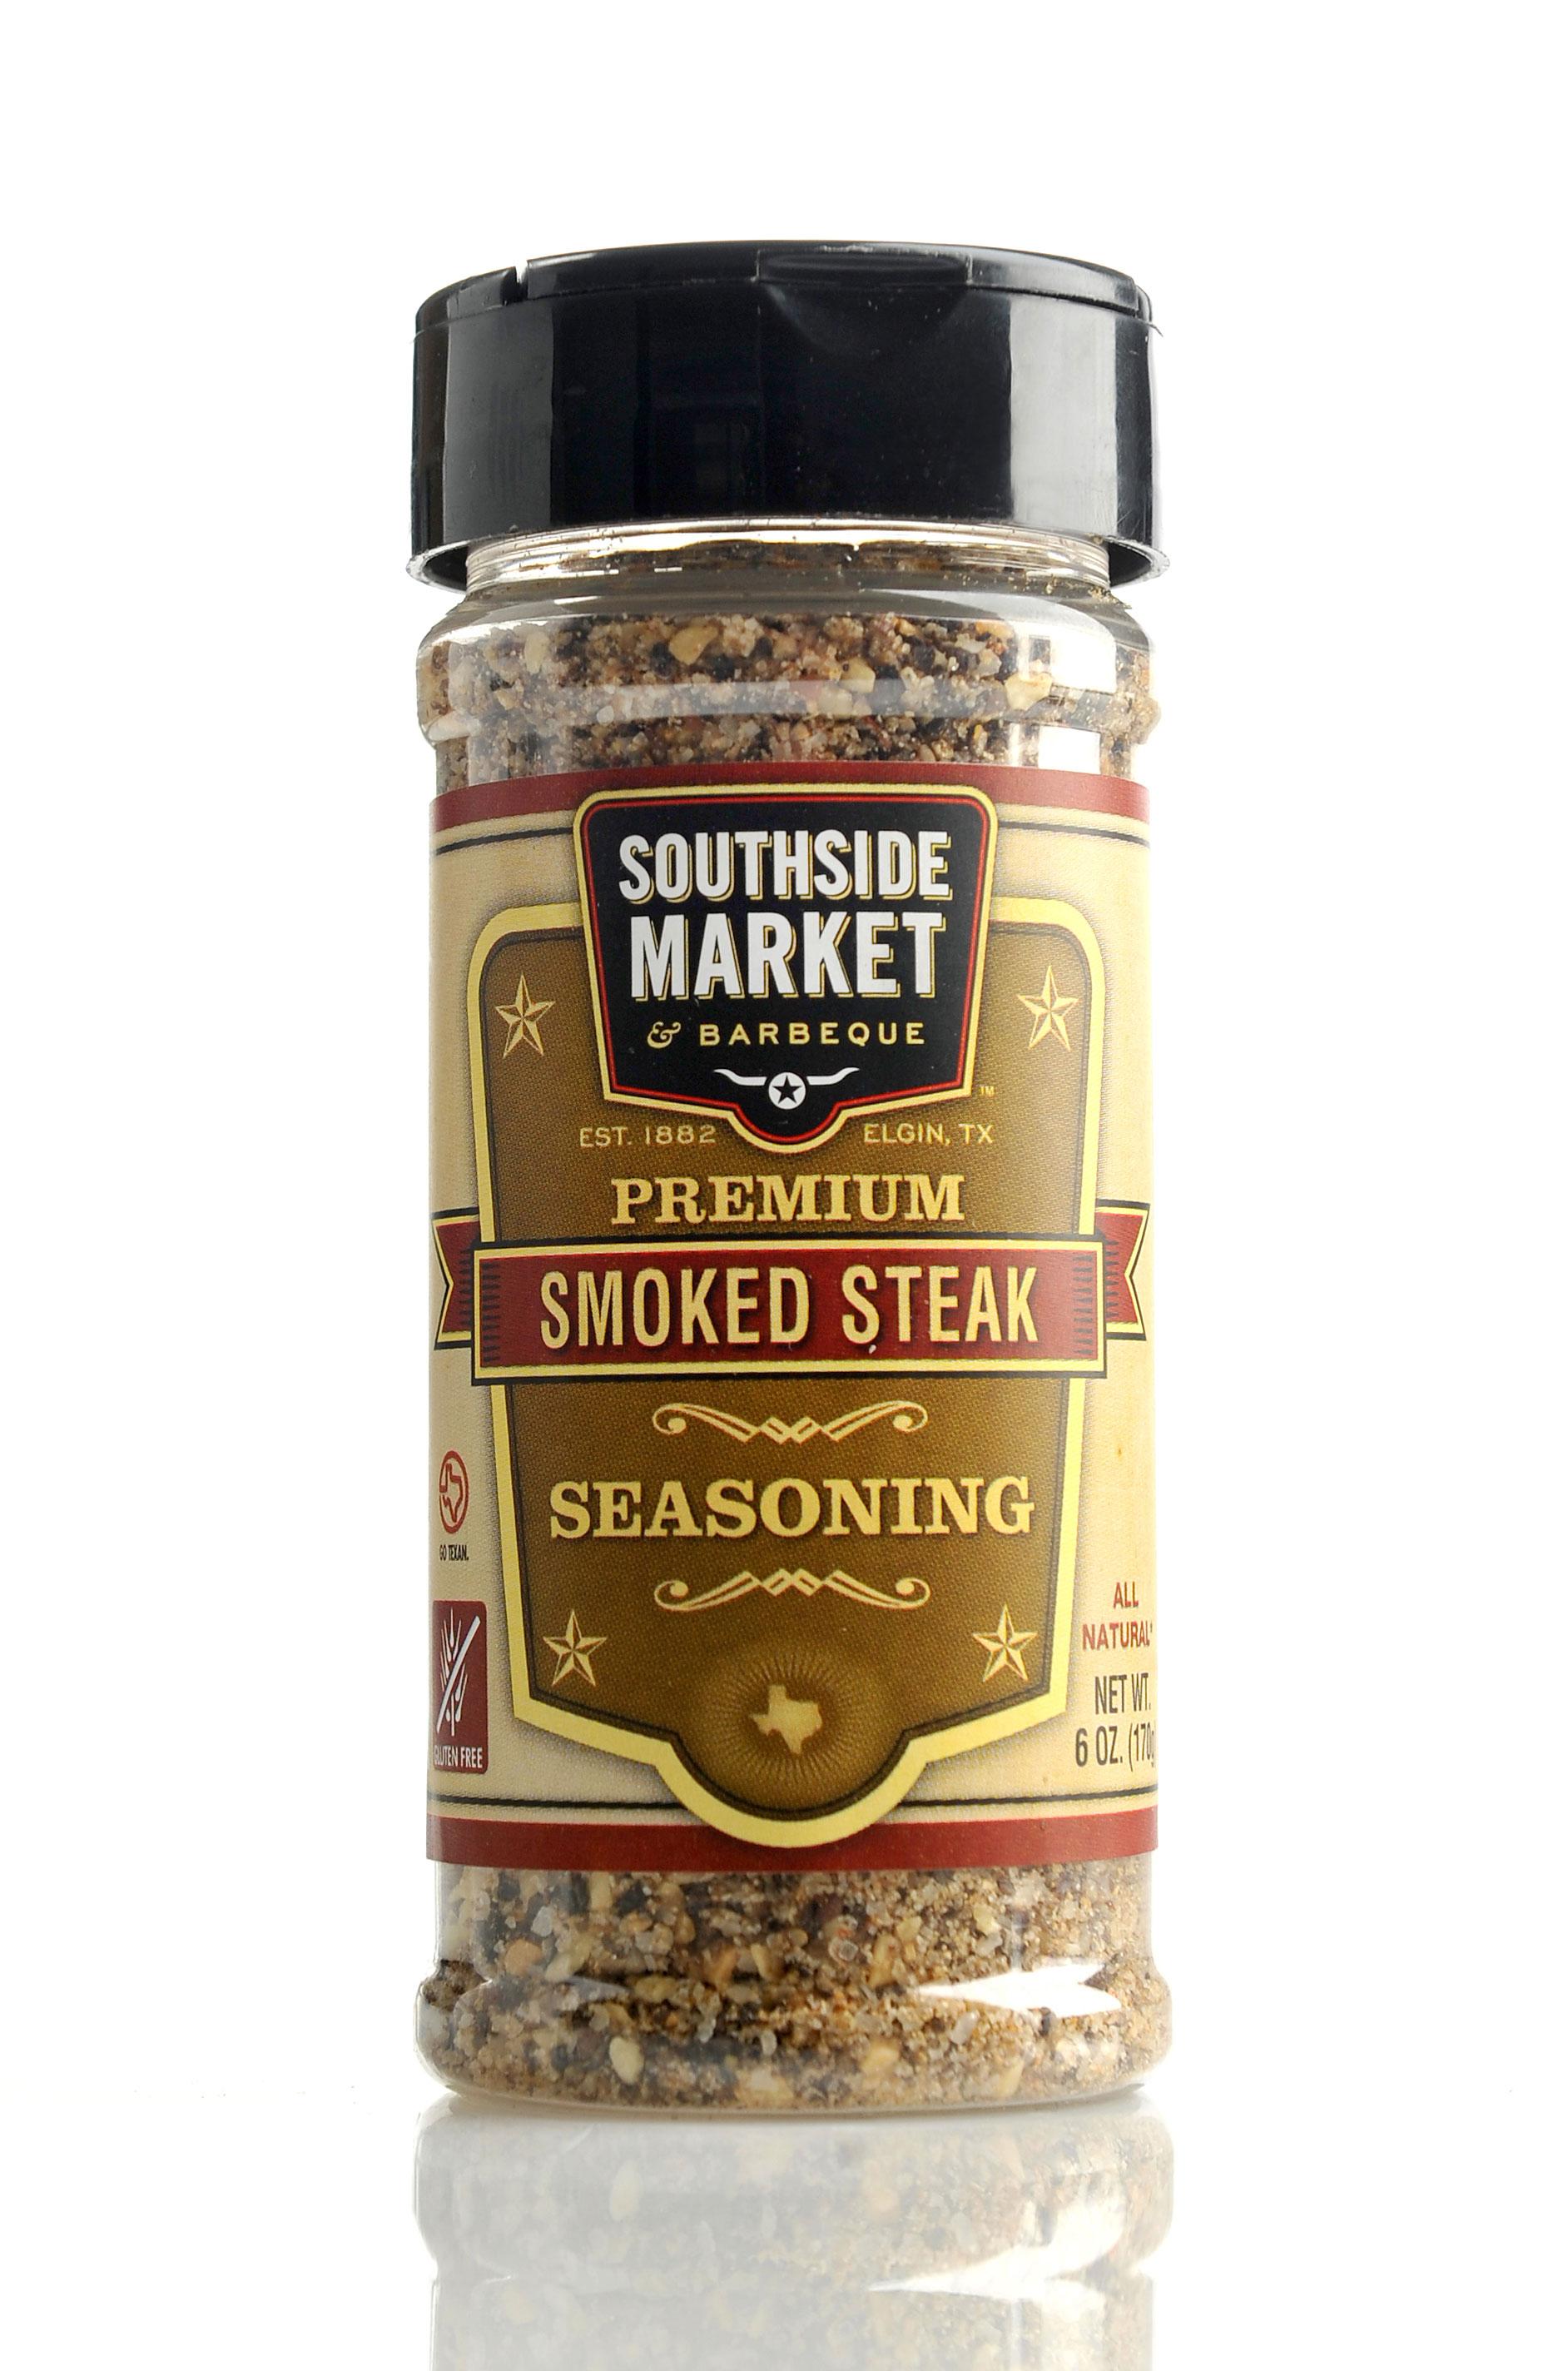 SOUTHSIDE MARKET Smoked Steak Seasoning Gewürzmischung 170g Bild 1